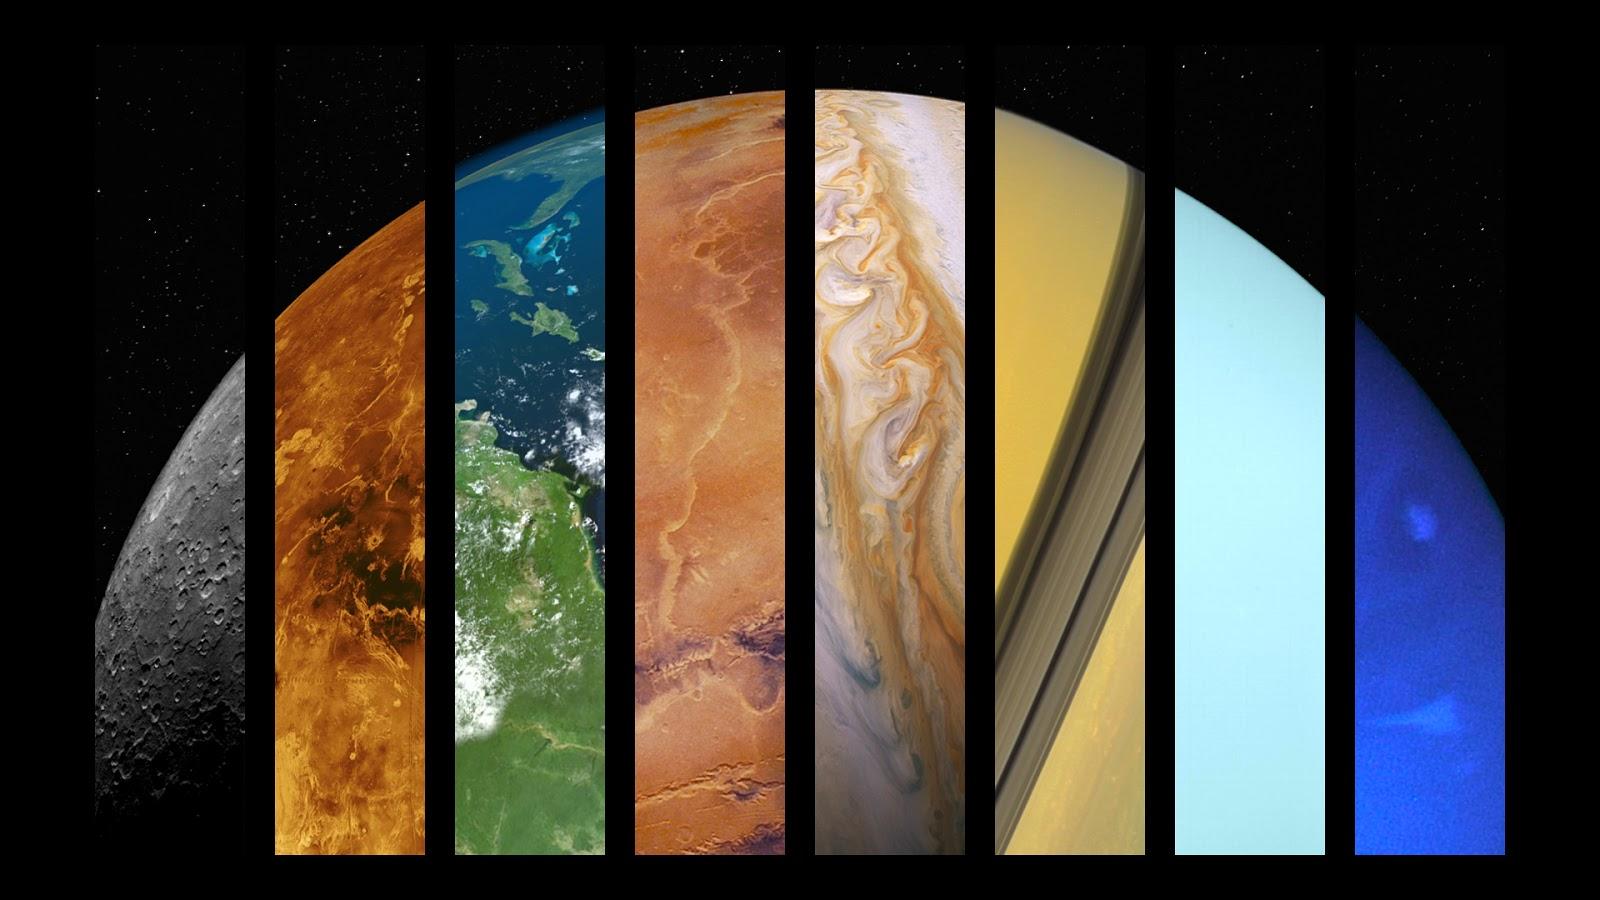 Pluto is dead to me elliptical orbit Wallpapers